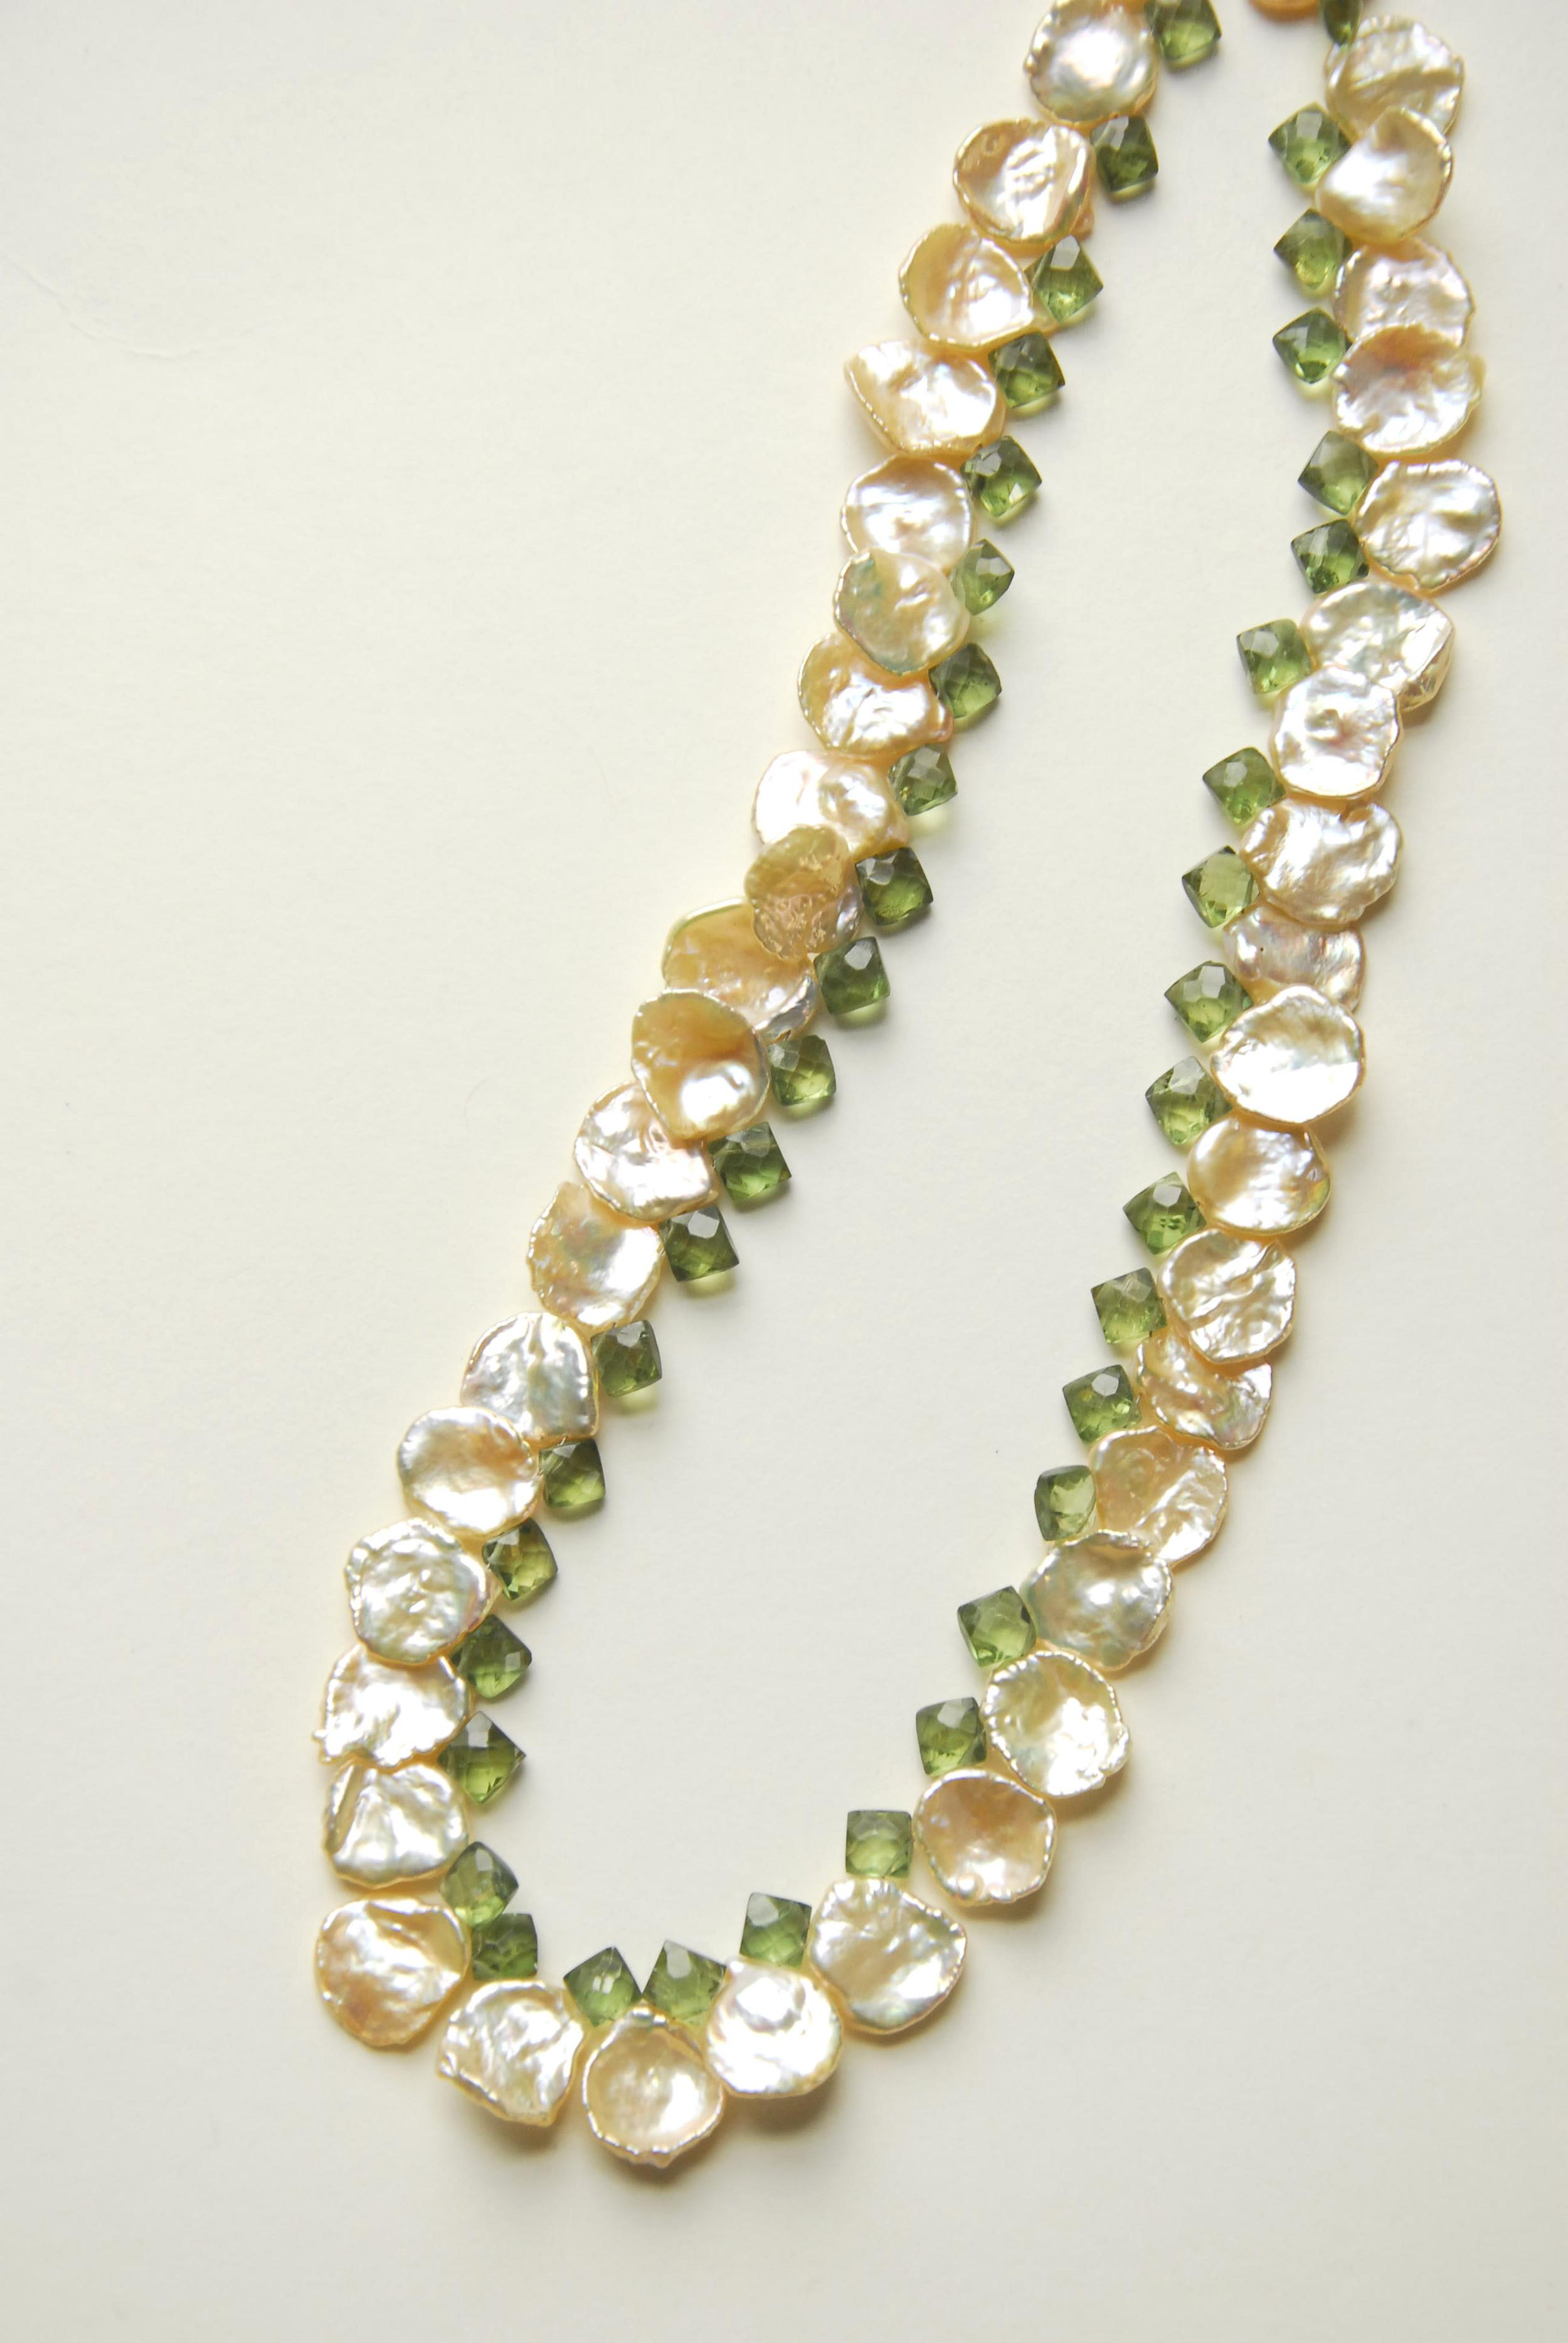 21814-more jewelry imagesFeb14_6118.jpg